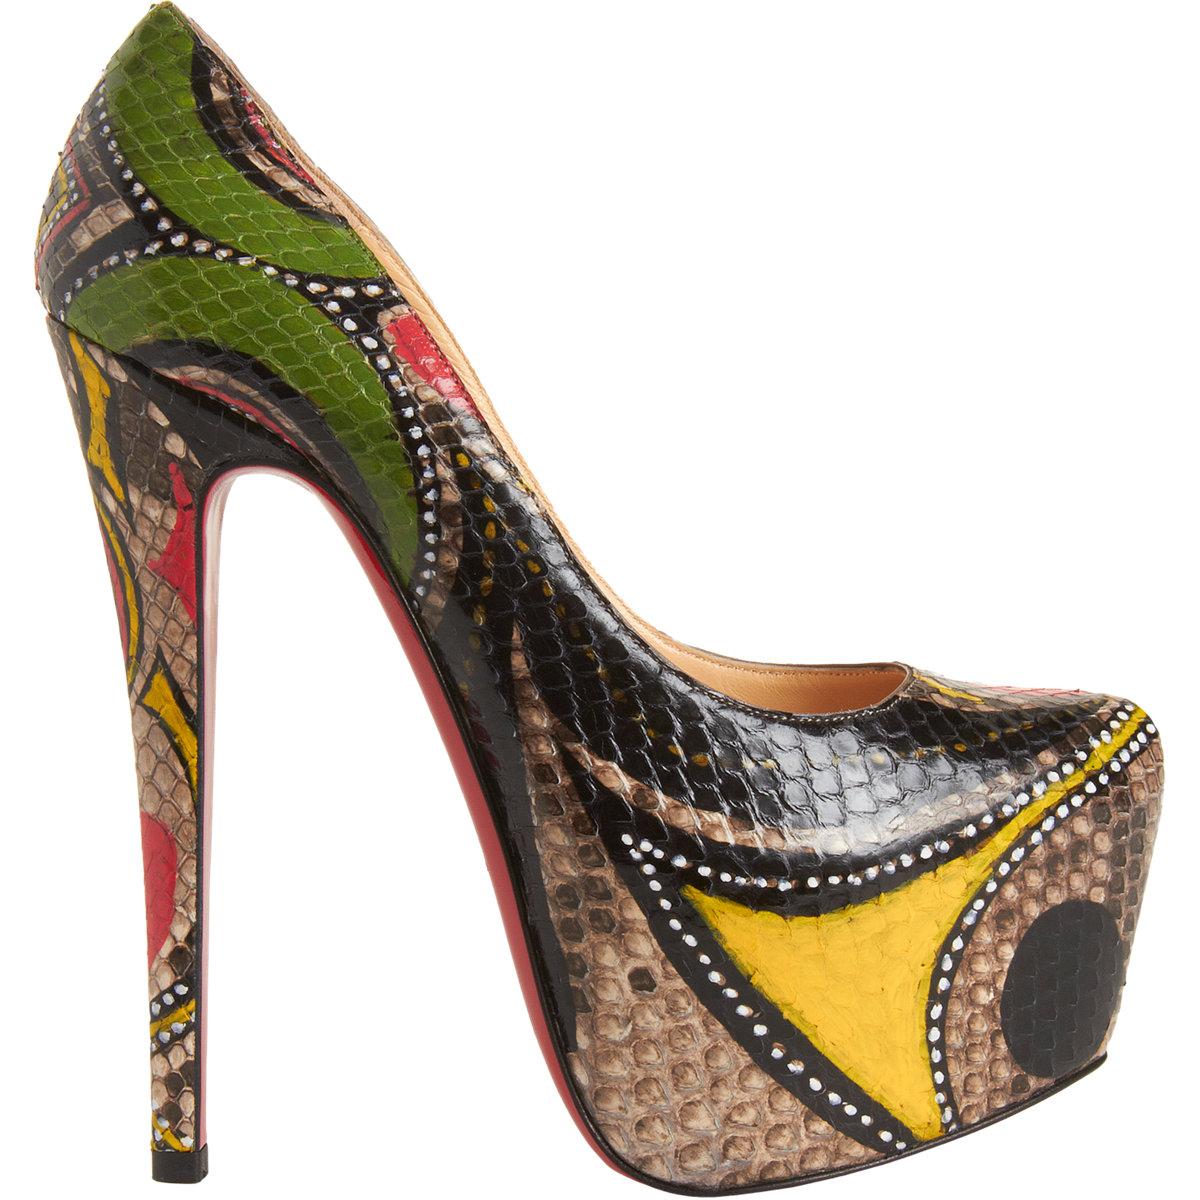 louboutin sneakers - christian louboutin Daffodile pumps Multicolor snakeskin ...